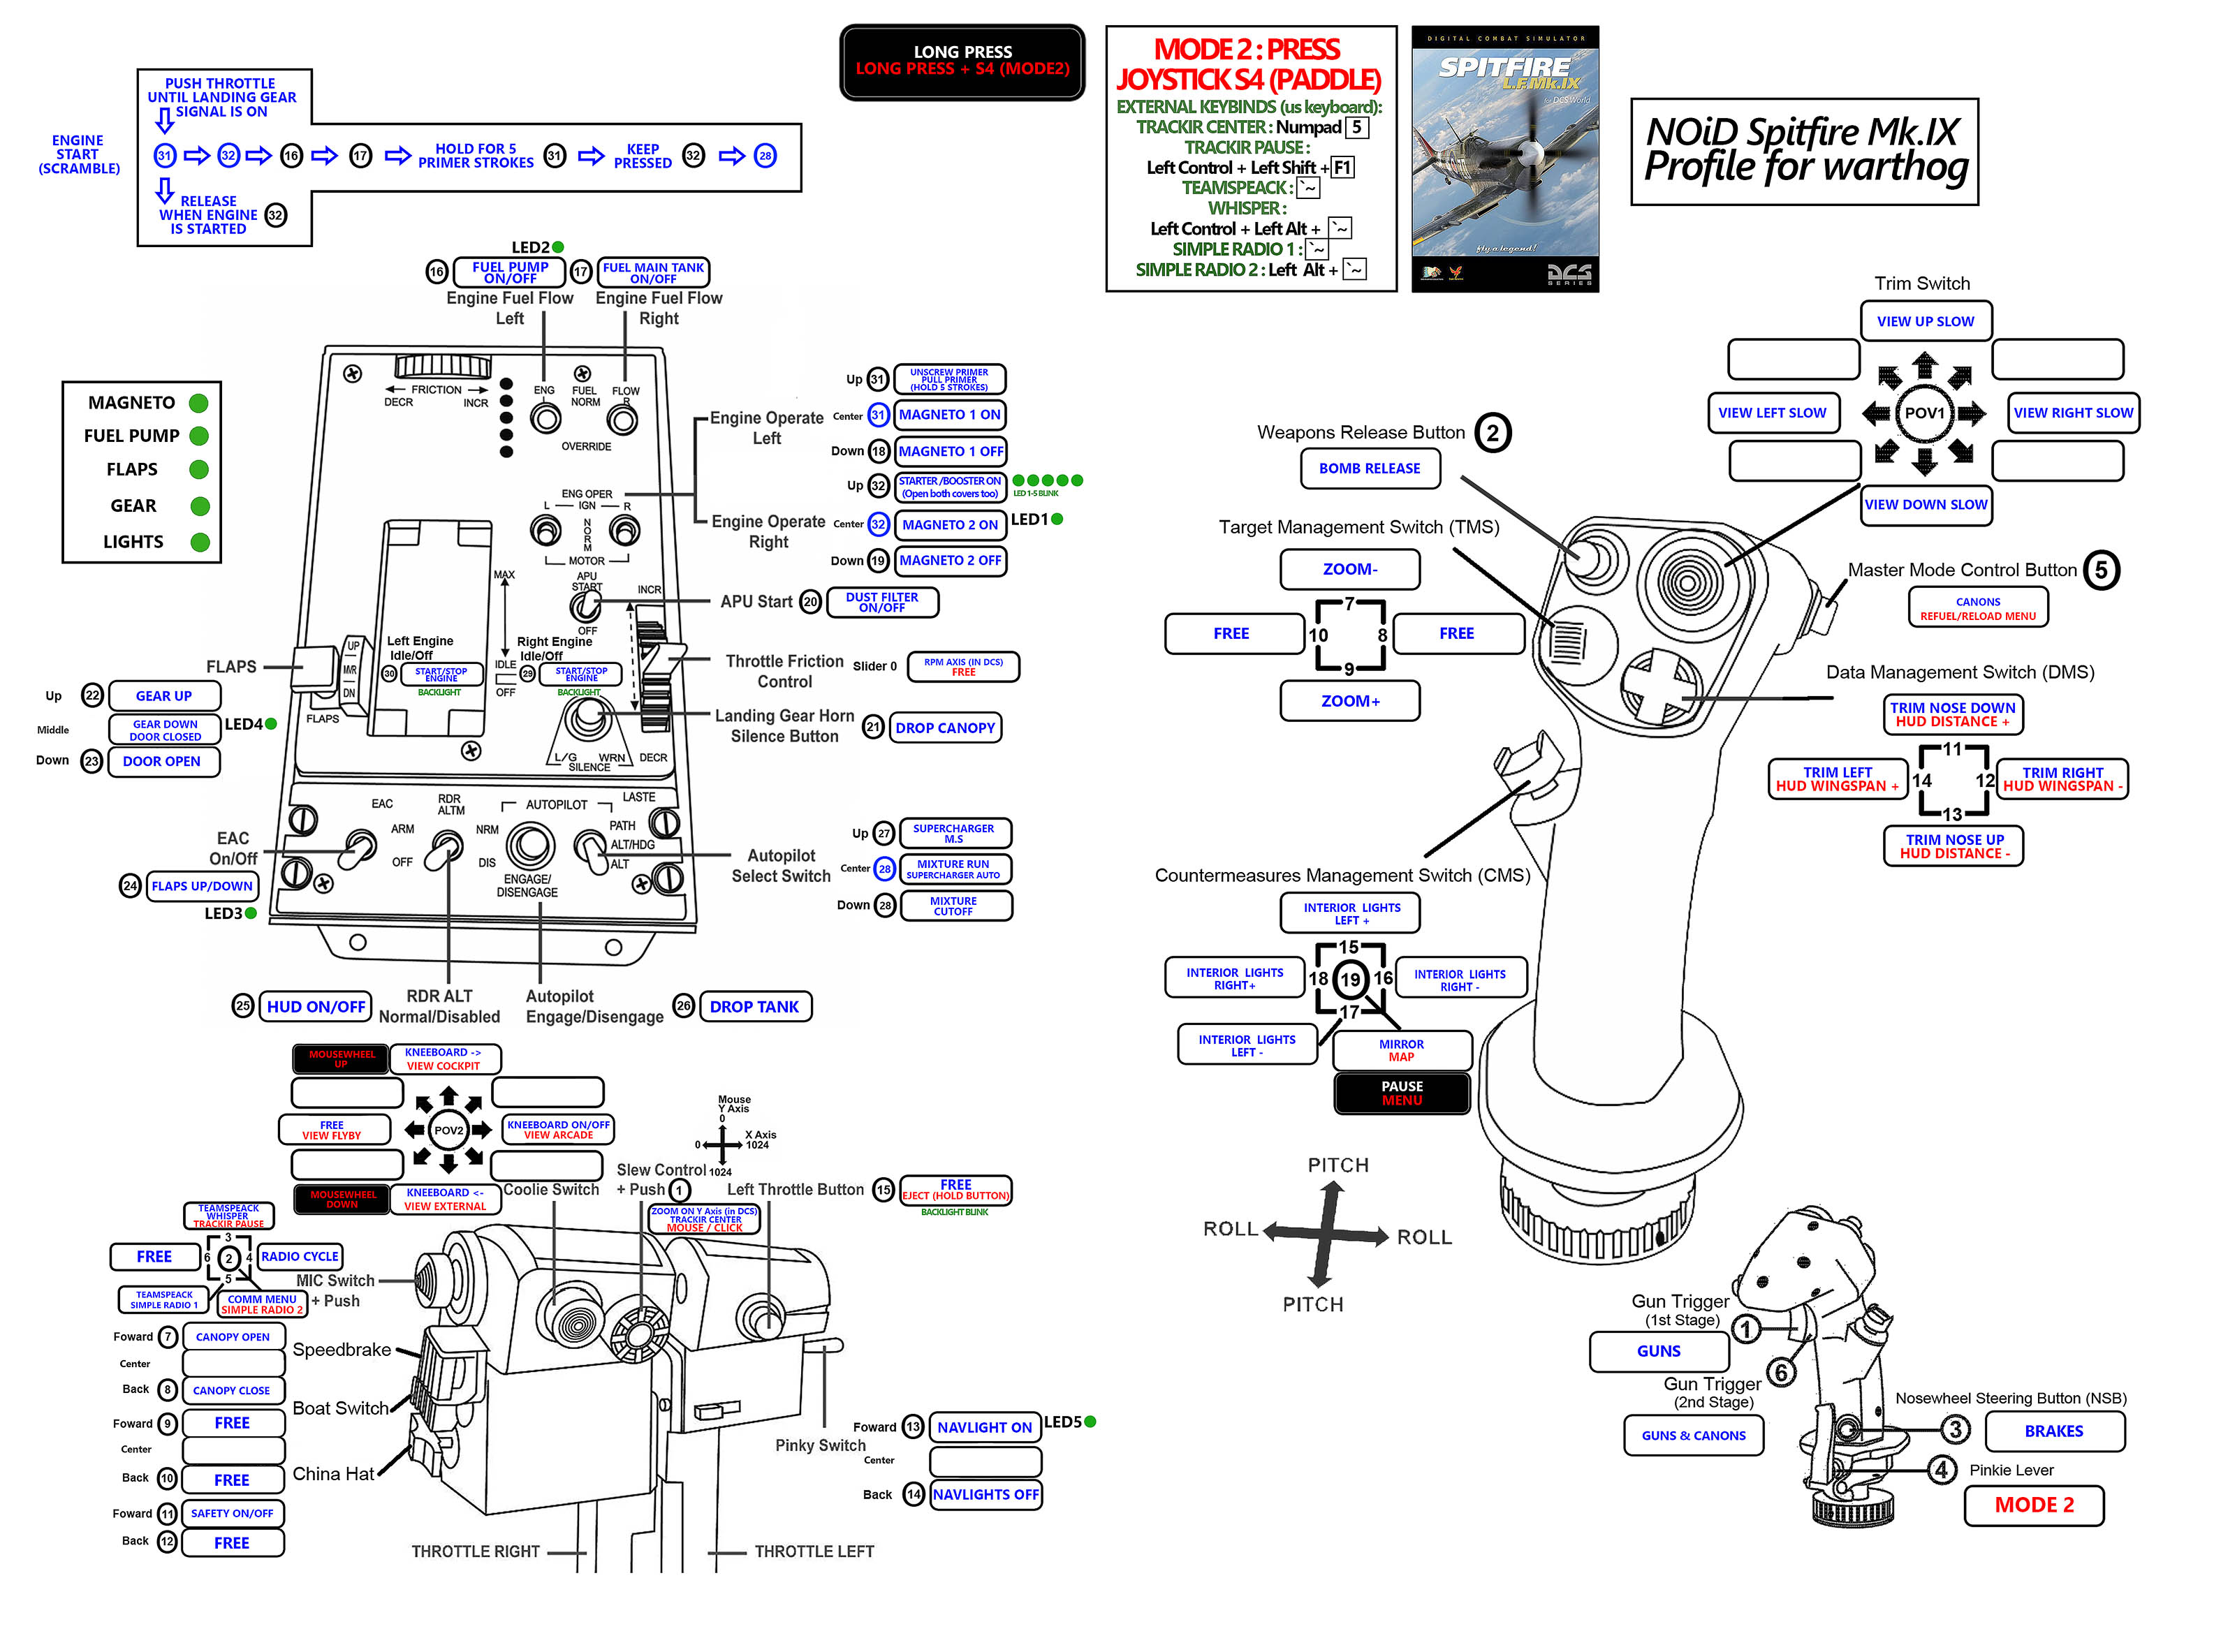 Hotas Warthog Profile for Spitfire LF Mk IX (Shiftstate/TrackIR